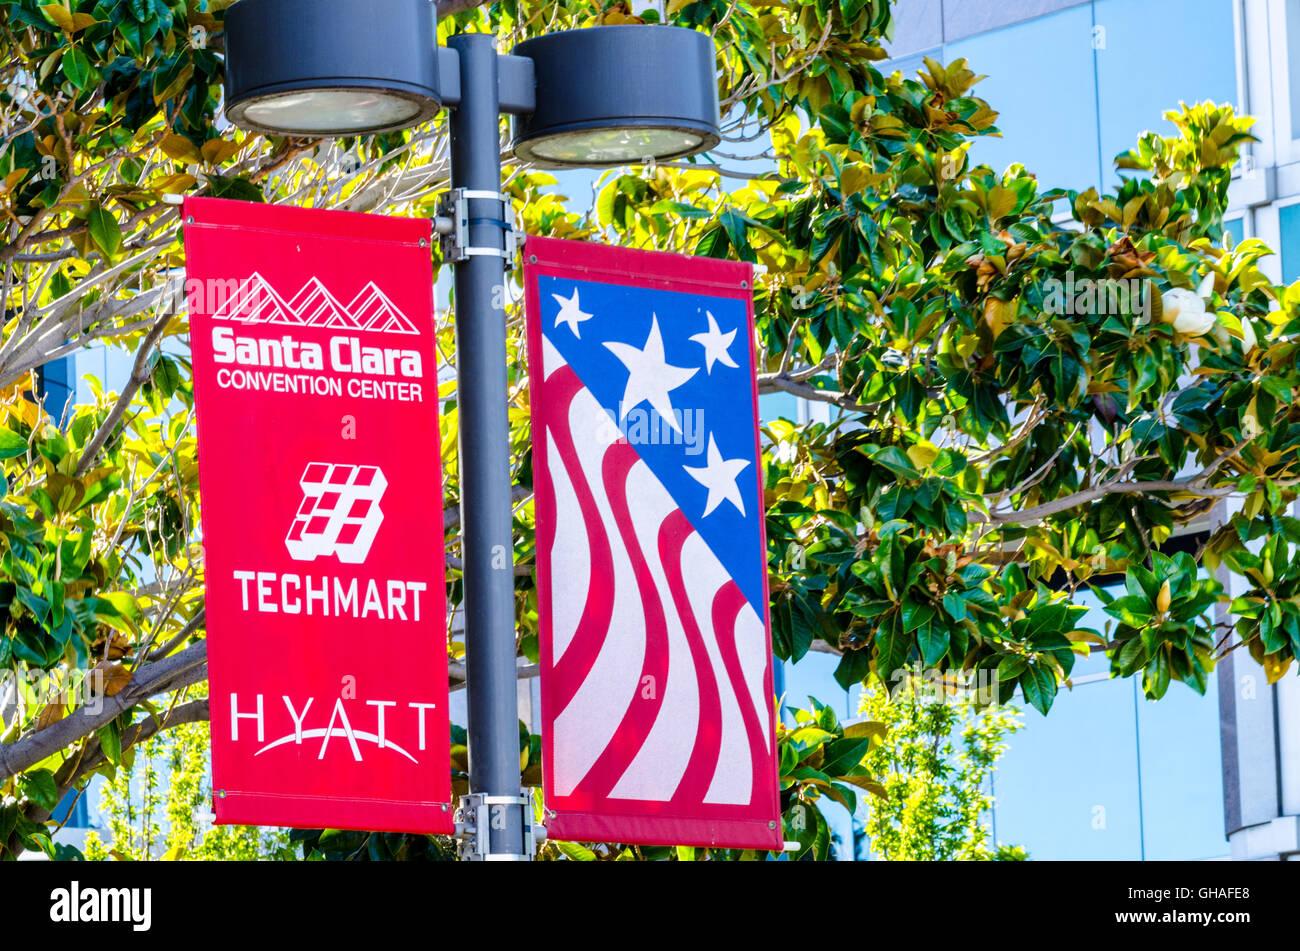 Banners near the Santa Clara Convention Center in Santa Clara California Stock Photo